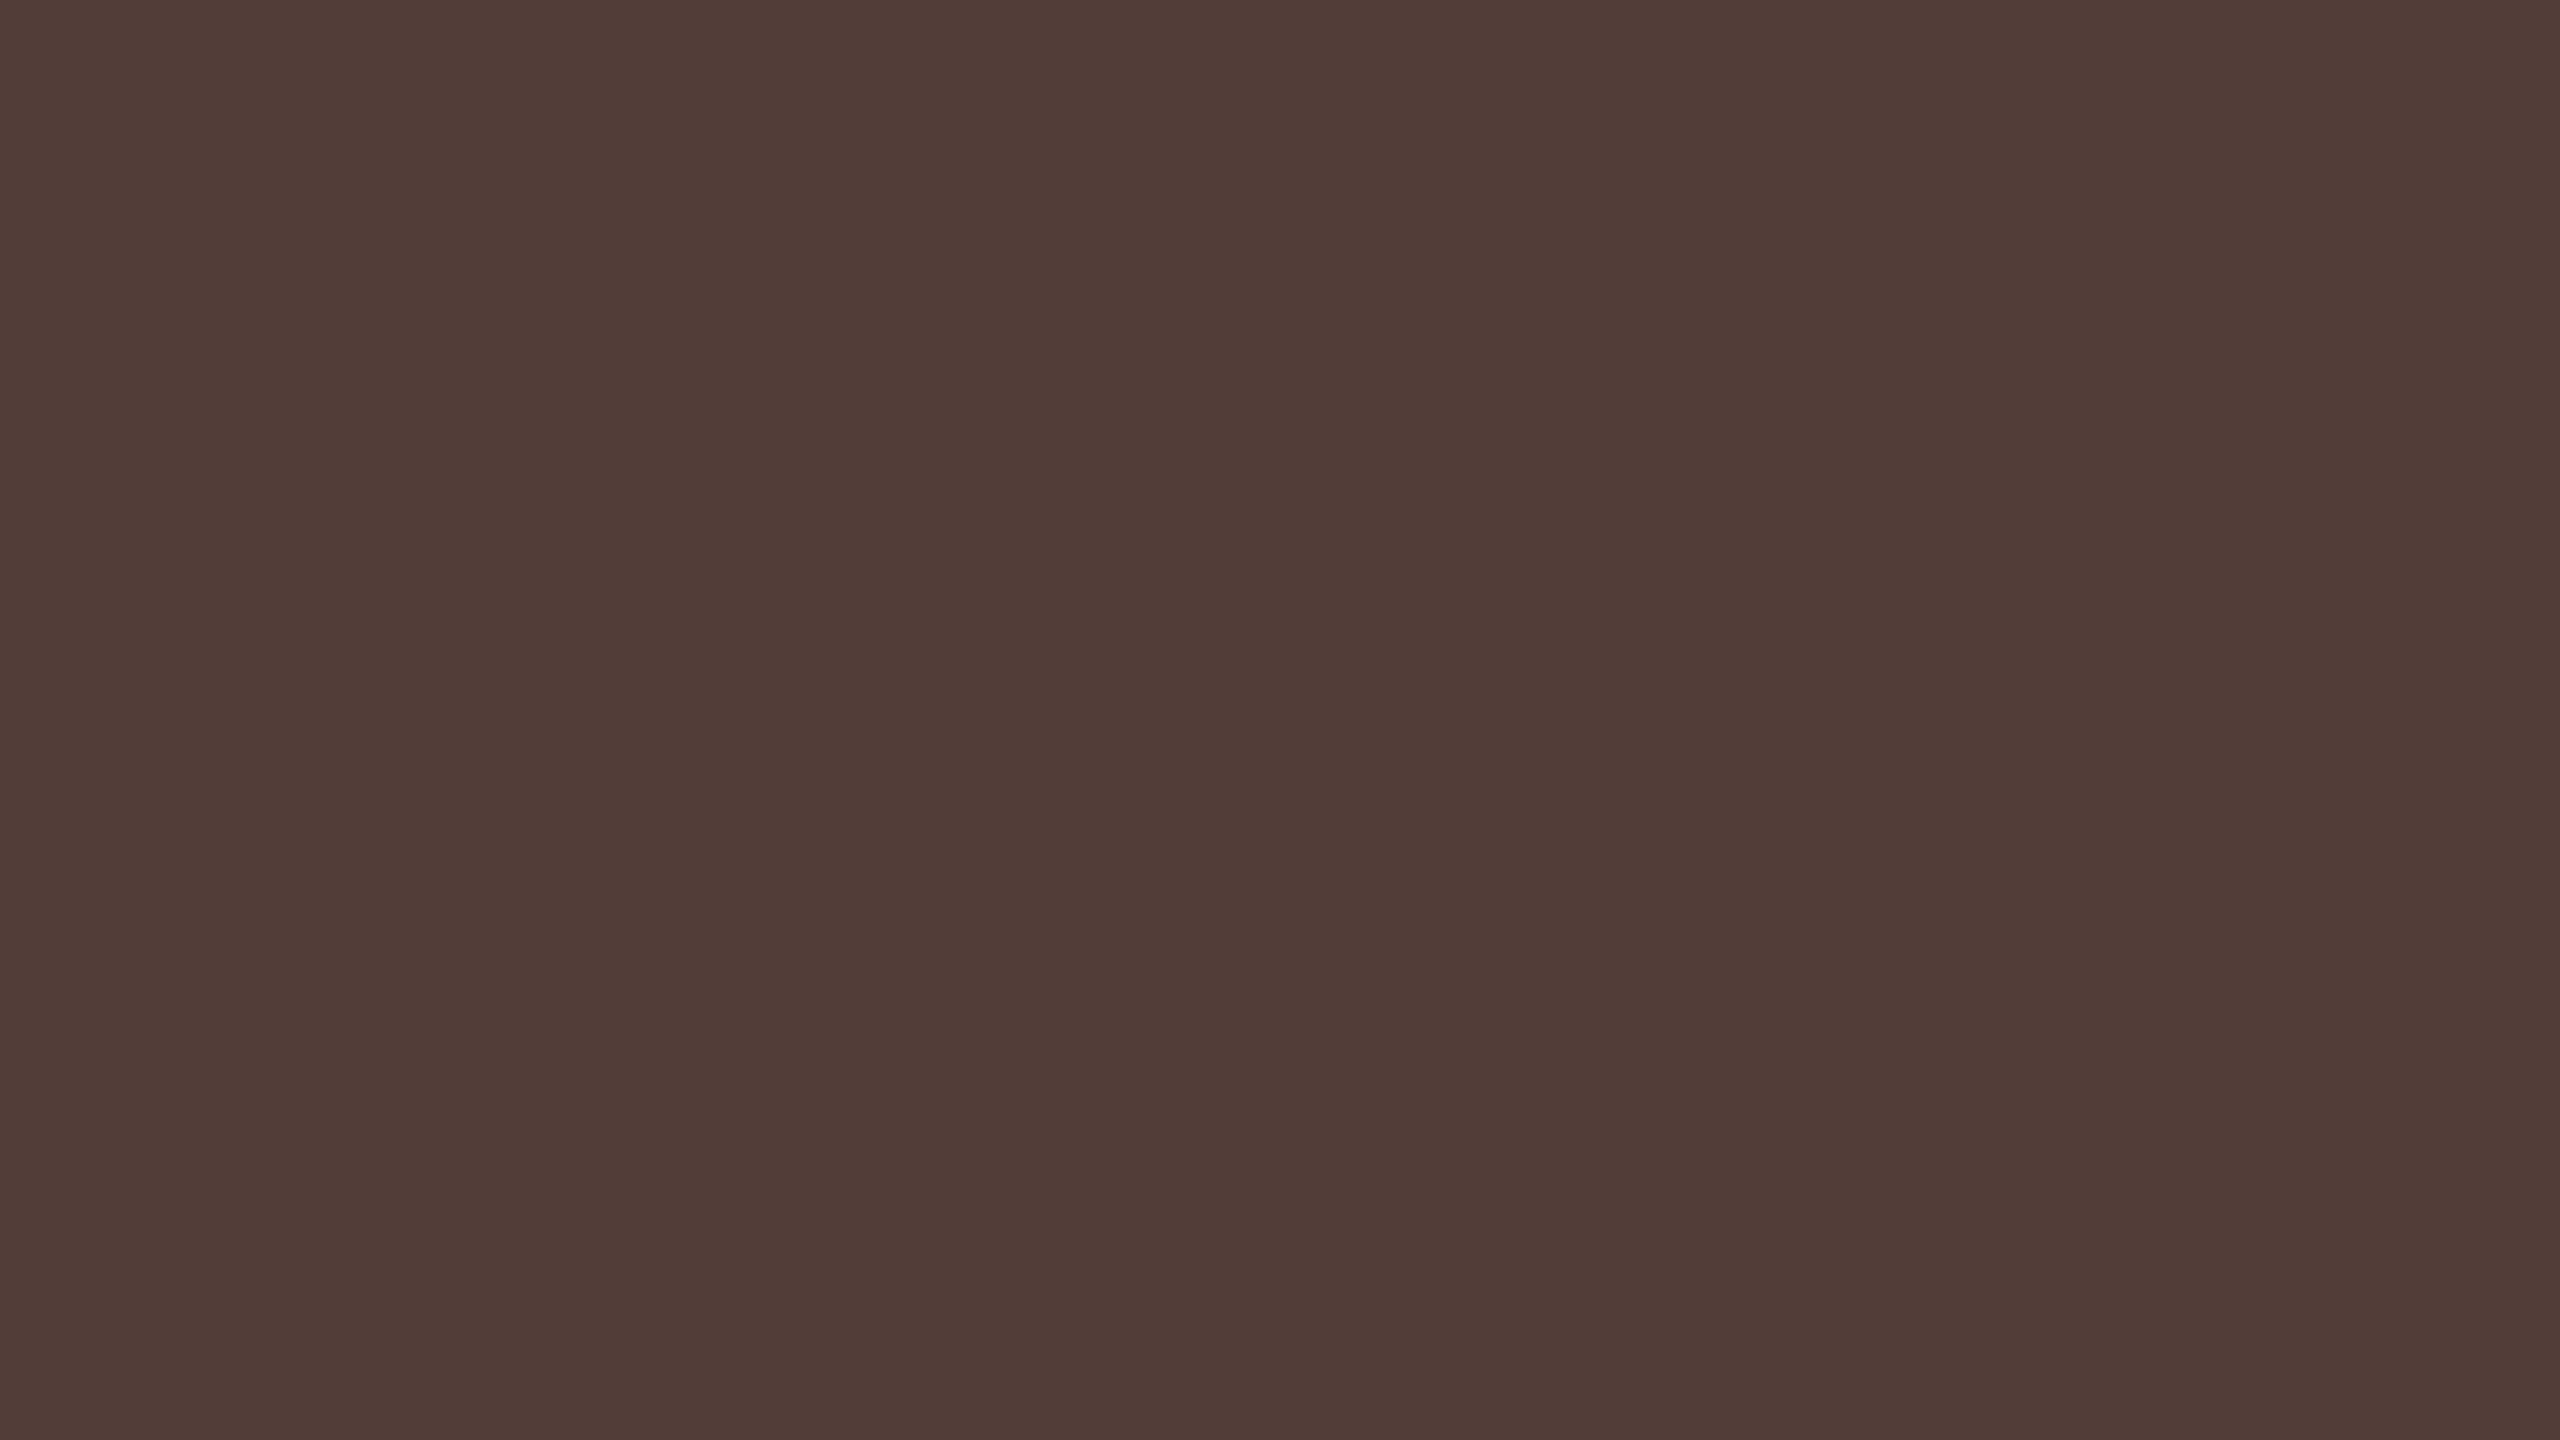 2560x1440 Dark Liver Horses Solid Color Background